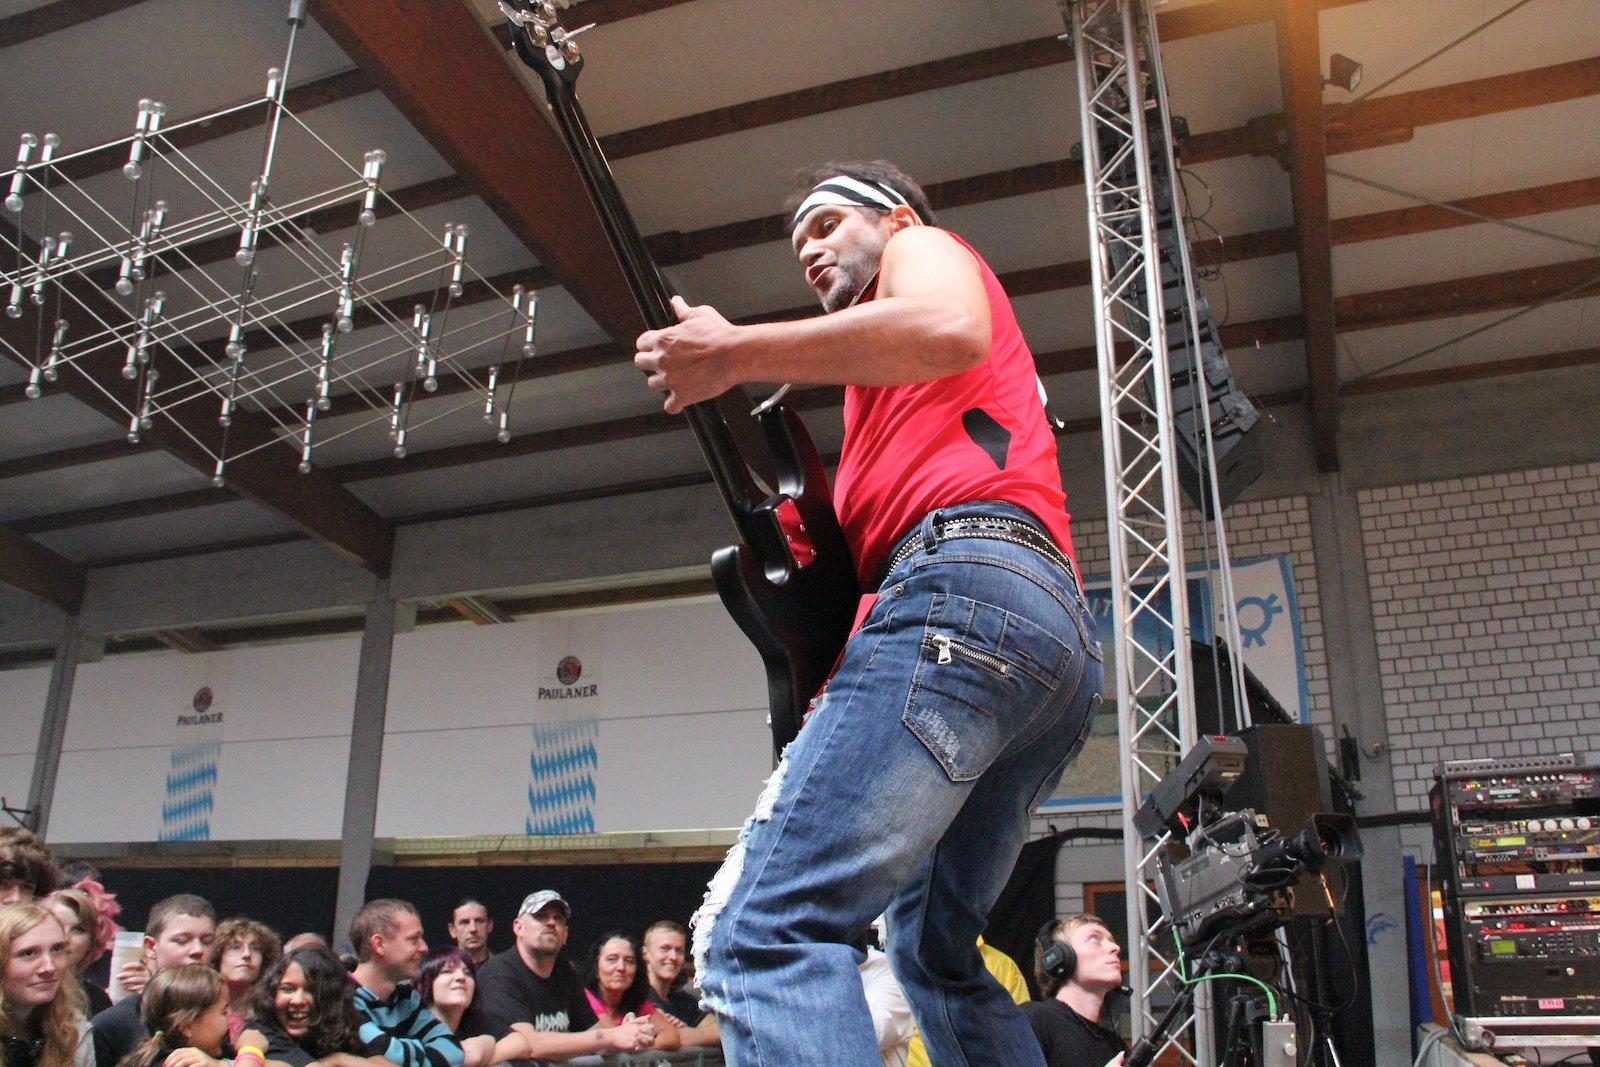 Stainless Quo - Sommerfesthalle, Otterstadt 18.06.2011 - 26